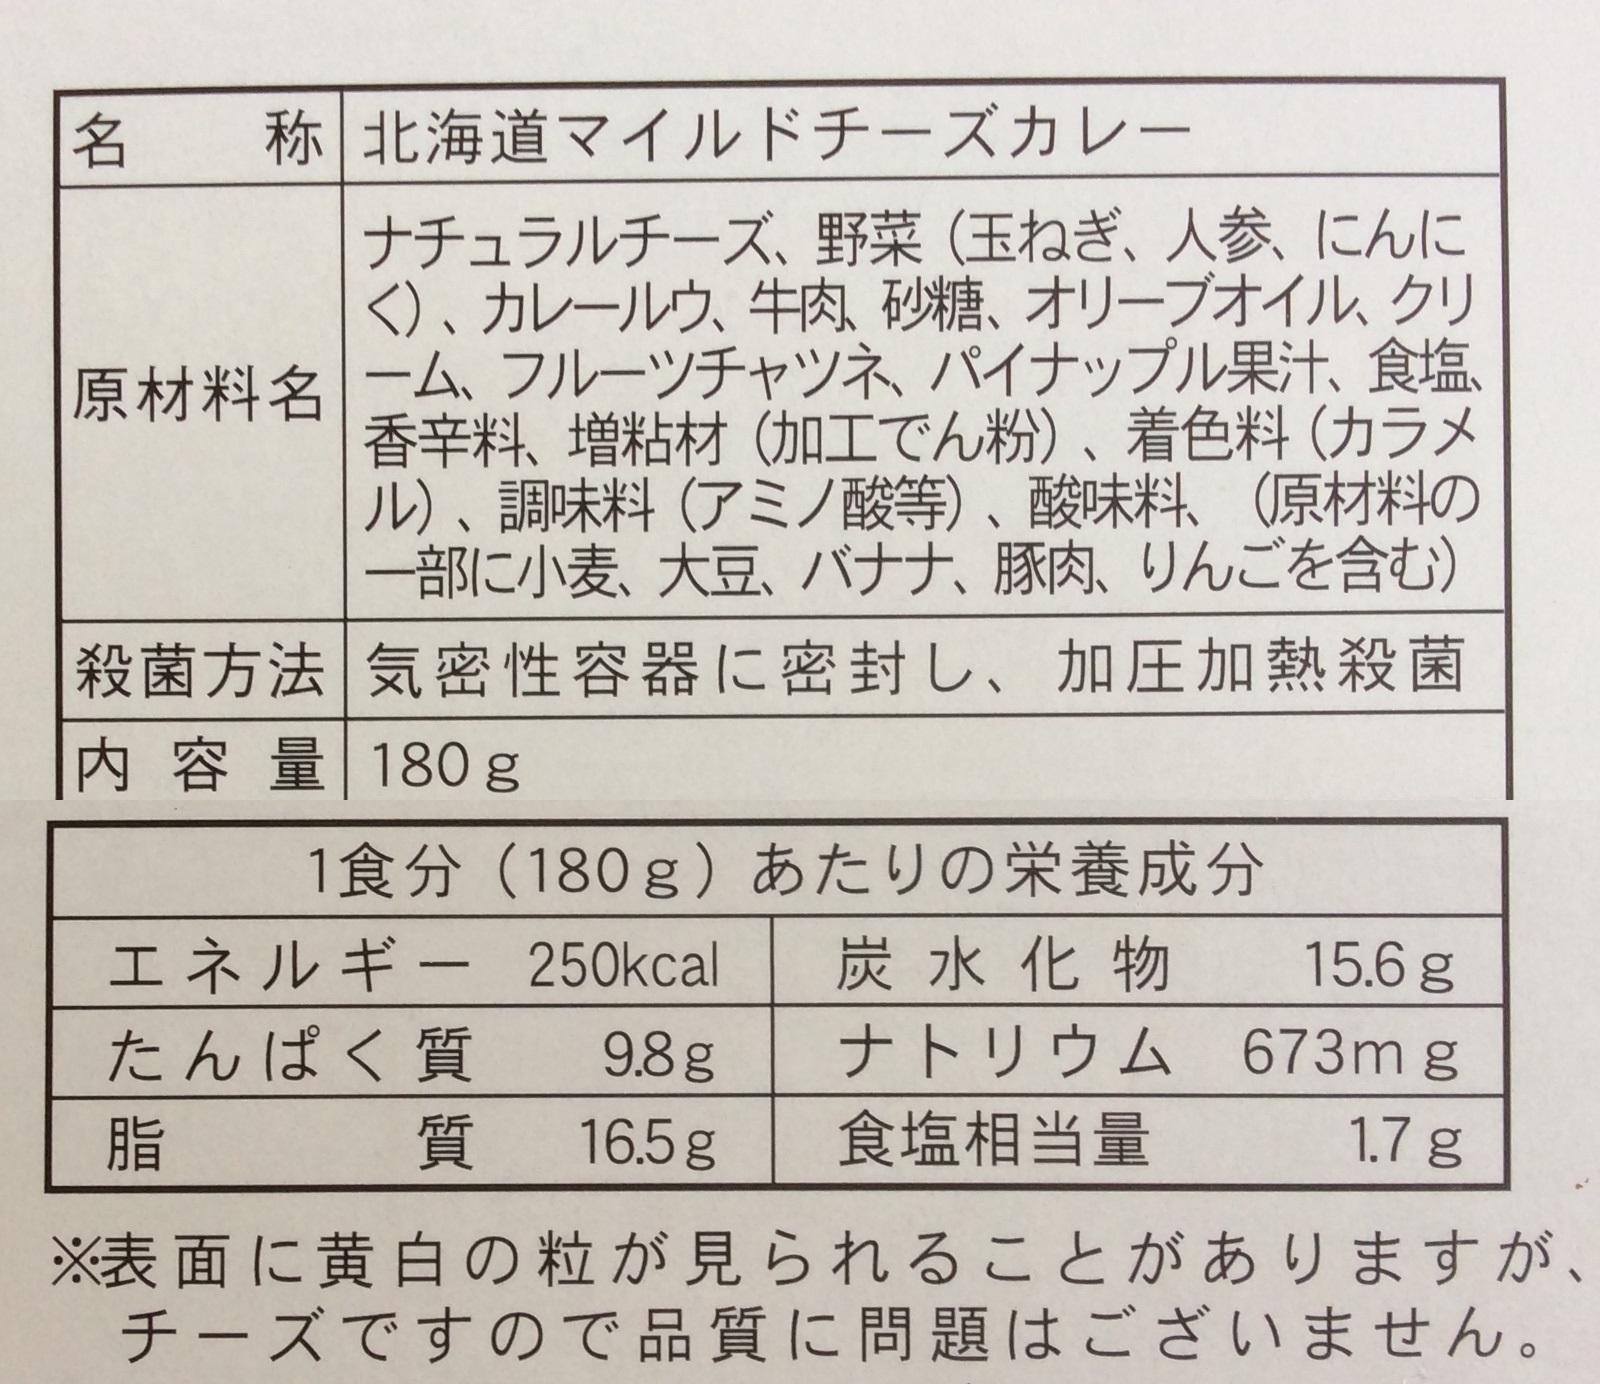 91F5B95E-5039-451E-AFB5-8BCB5E7D2B01.jpeg